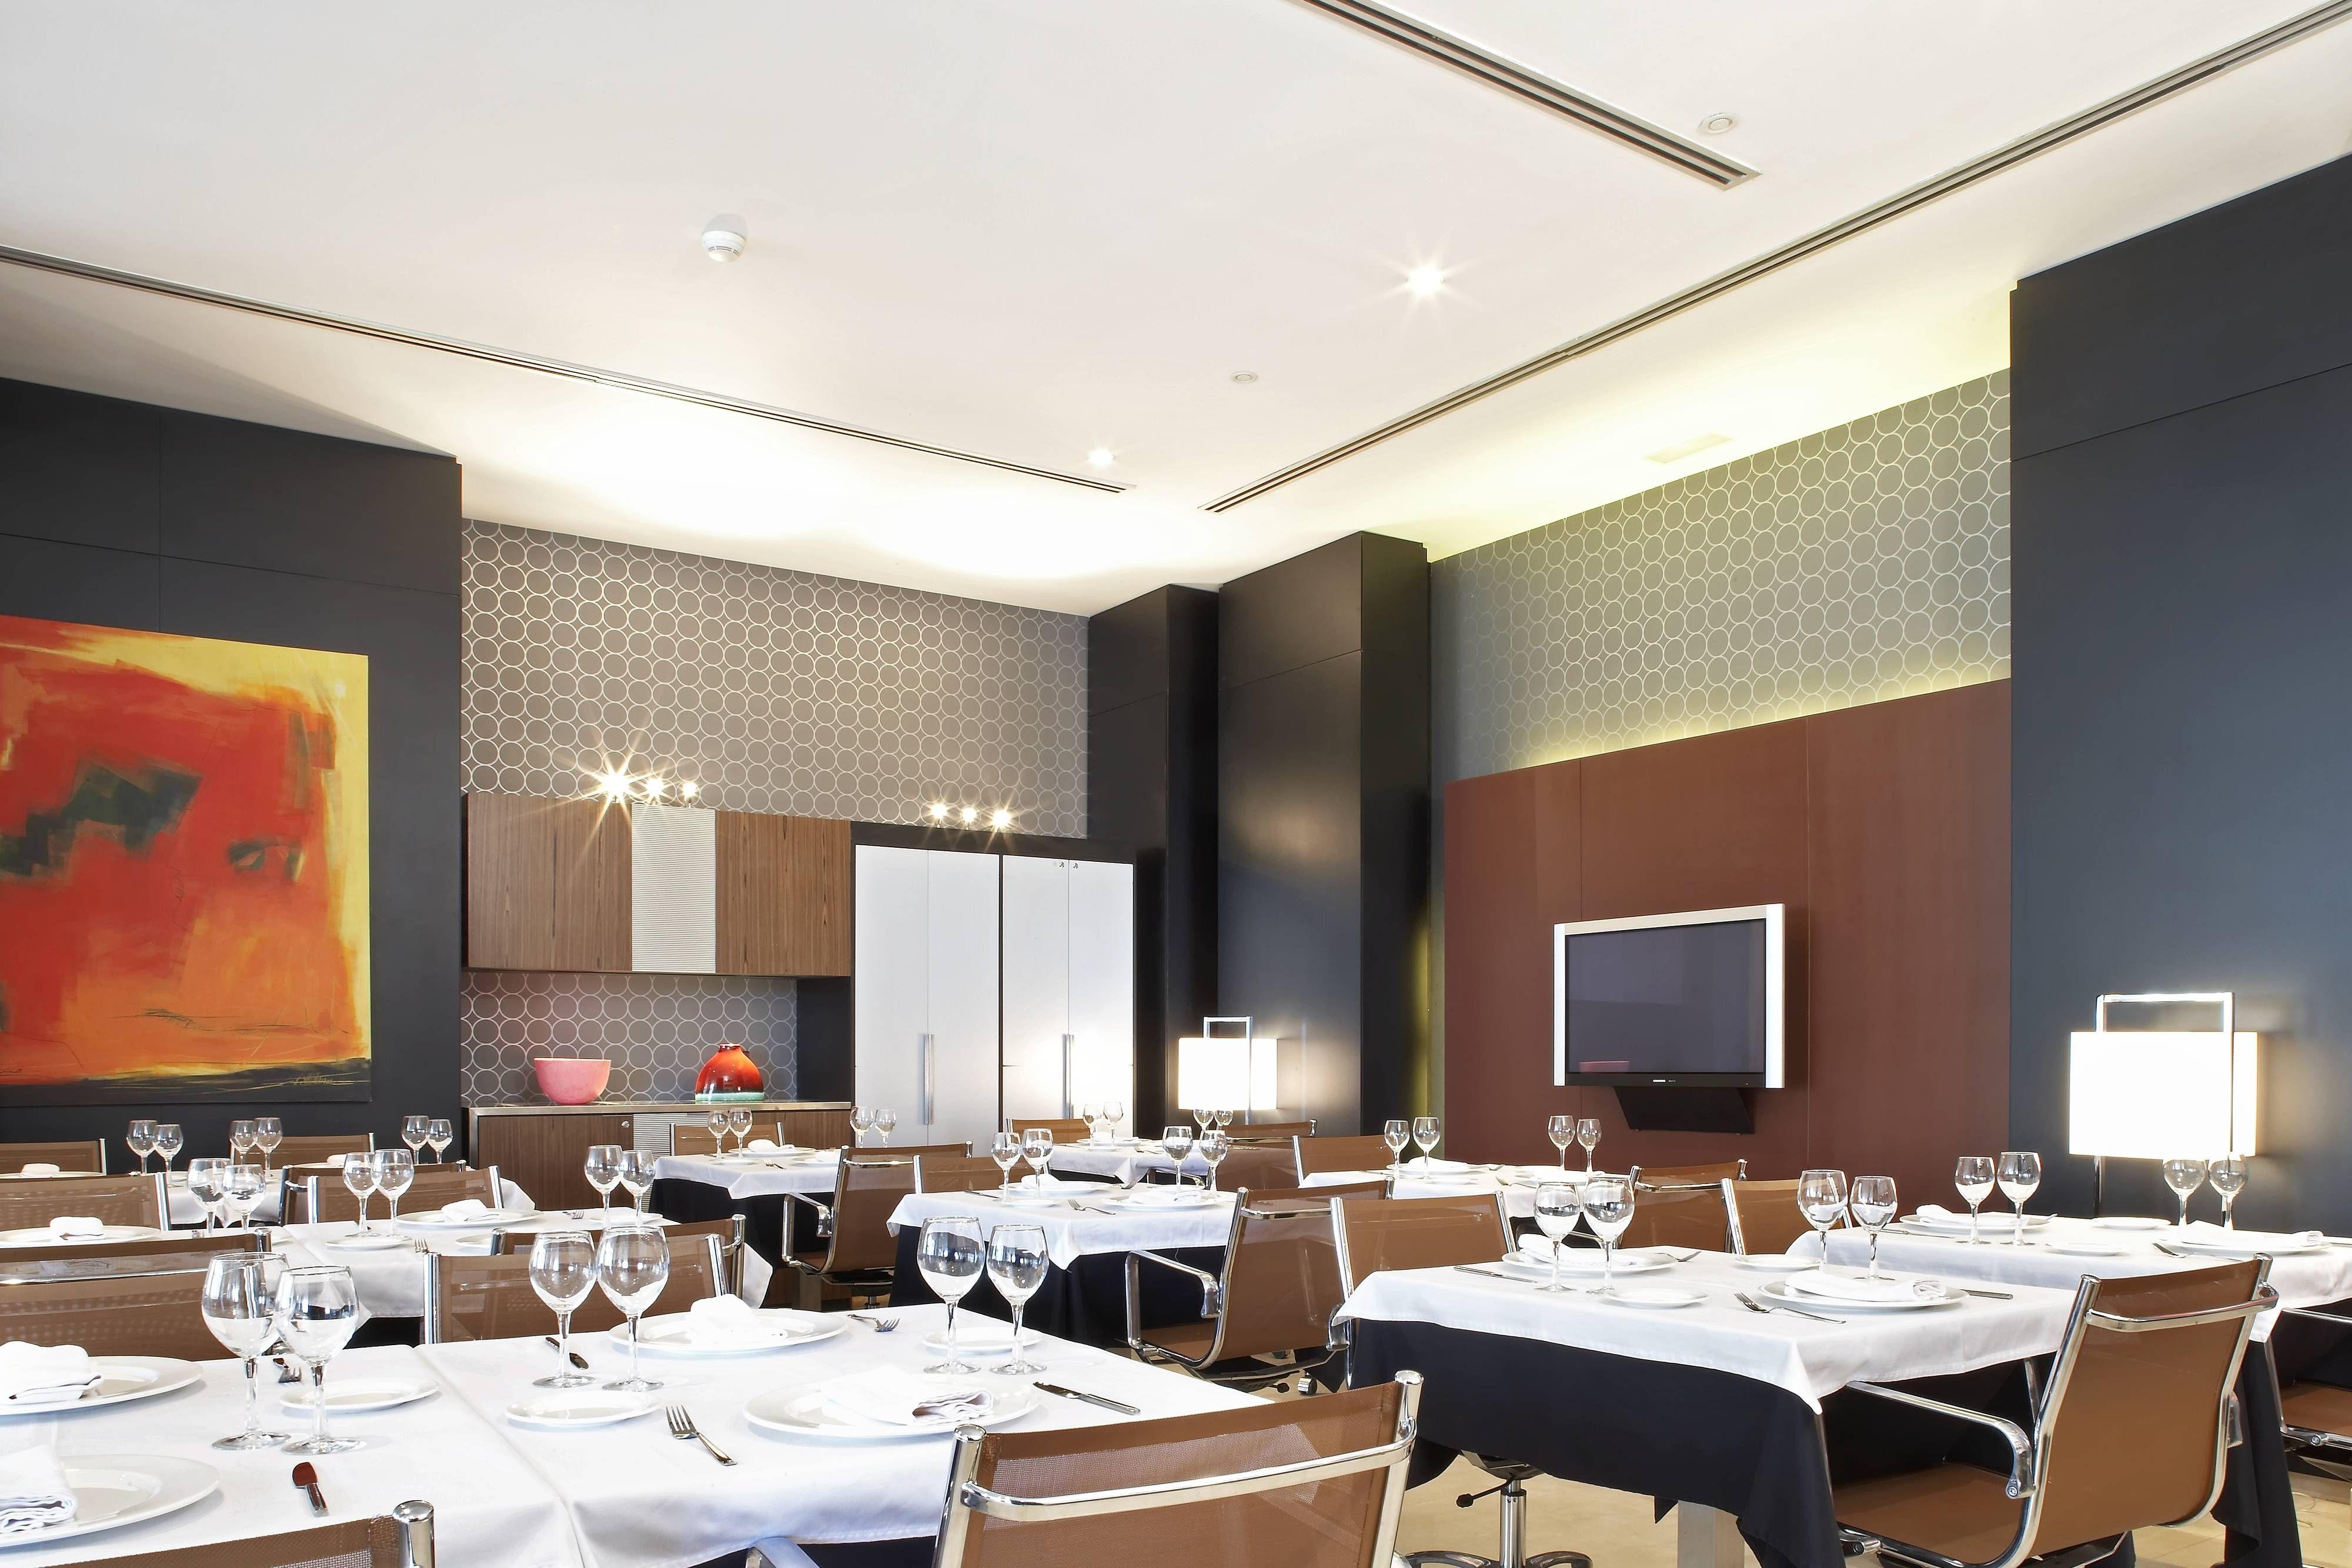 Ac Hotel Algeciras Dining Area #Guestroom, #Relax, #Comfort,